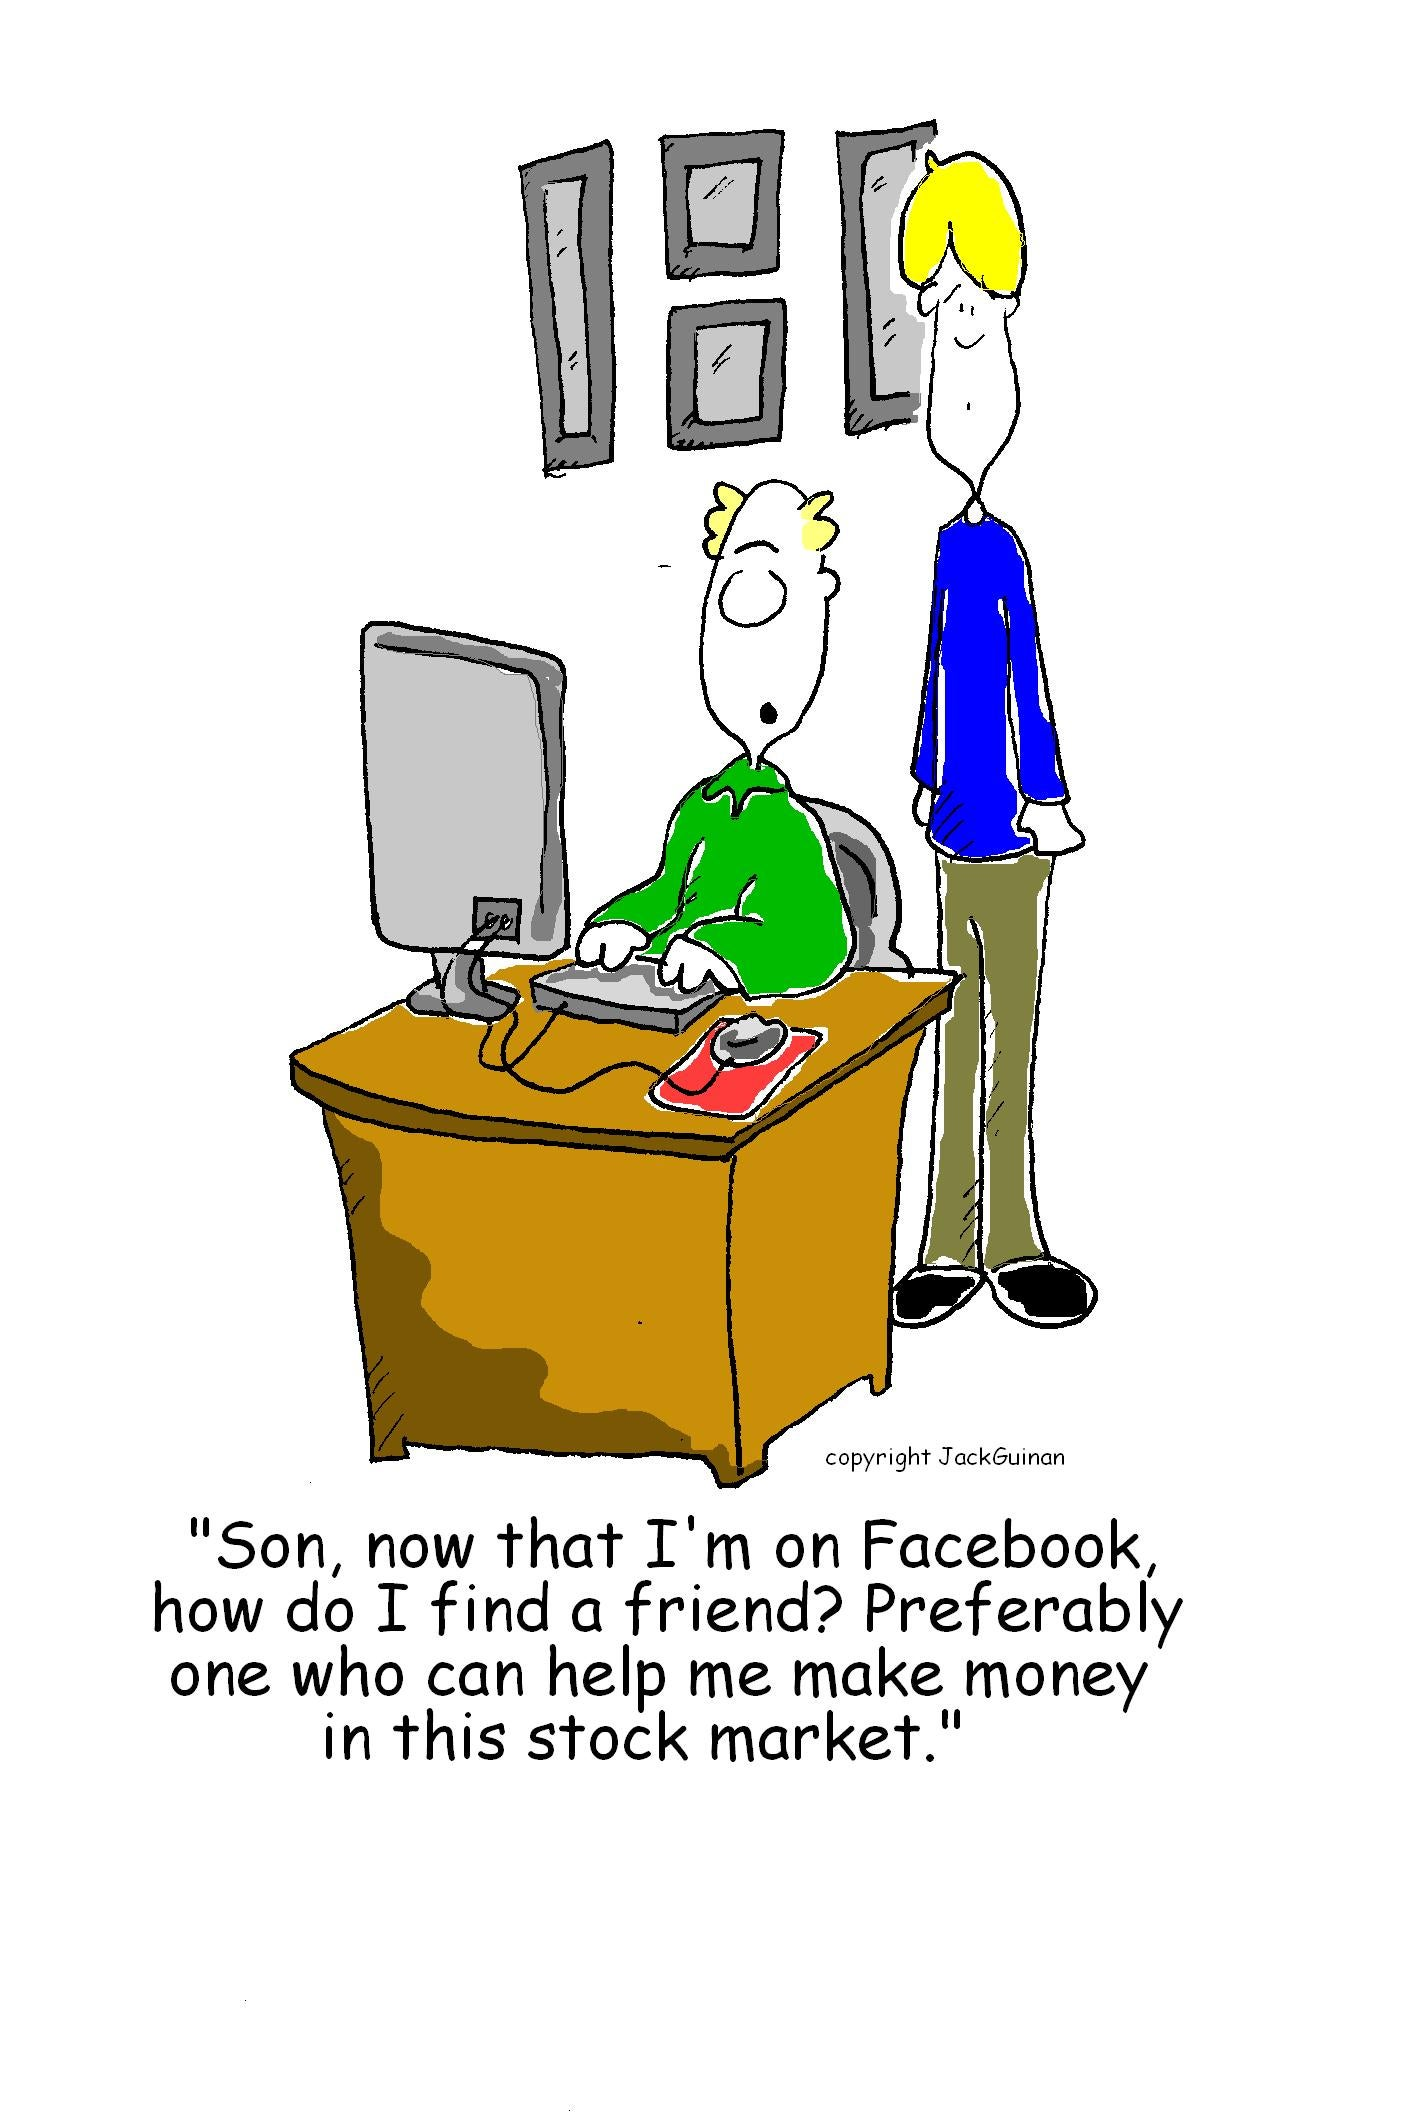 Facebookandfriends